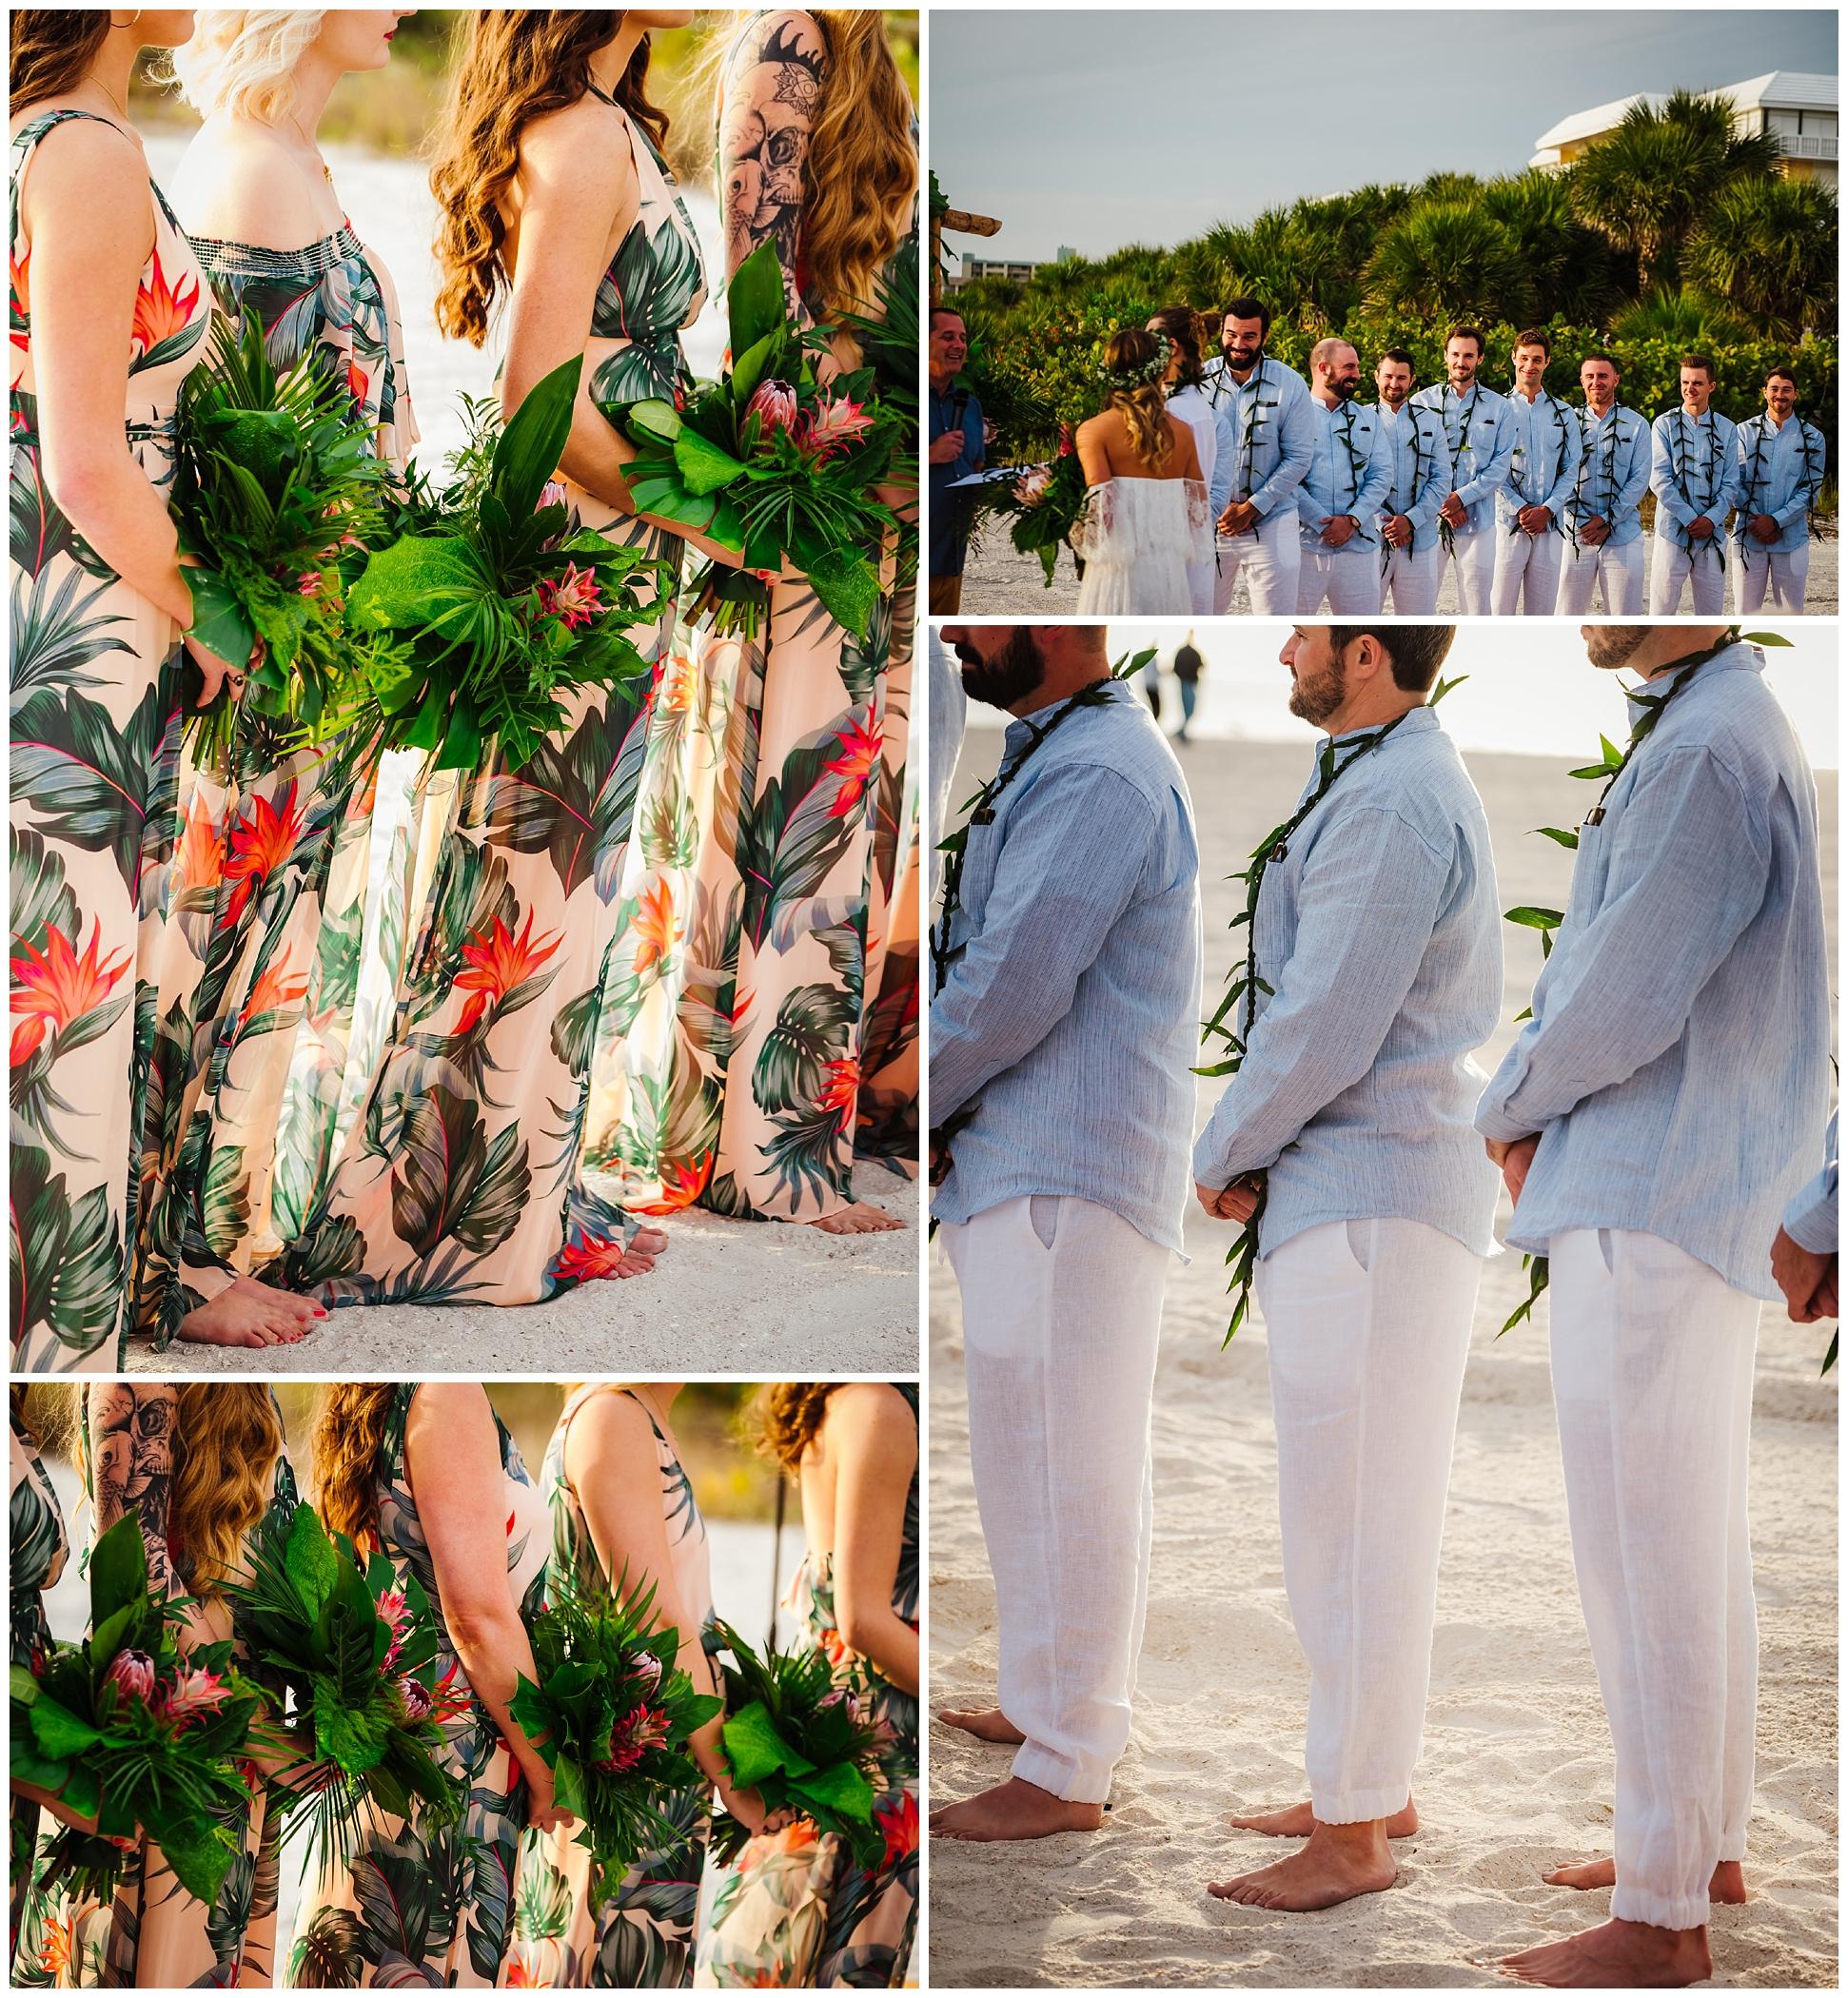 tampa-bay-wedding-photographer-barefoot-post-card-inn-tropical-hawaiin-lei-pink-pineapples-flower-crown_0170.jpg